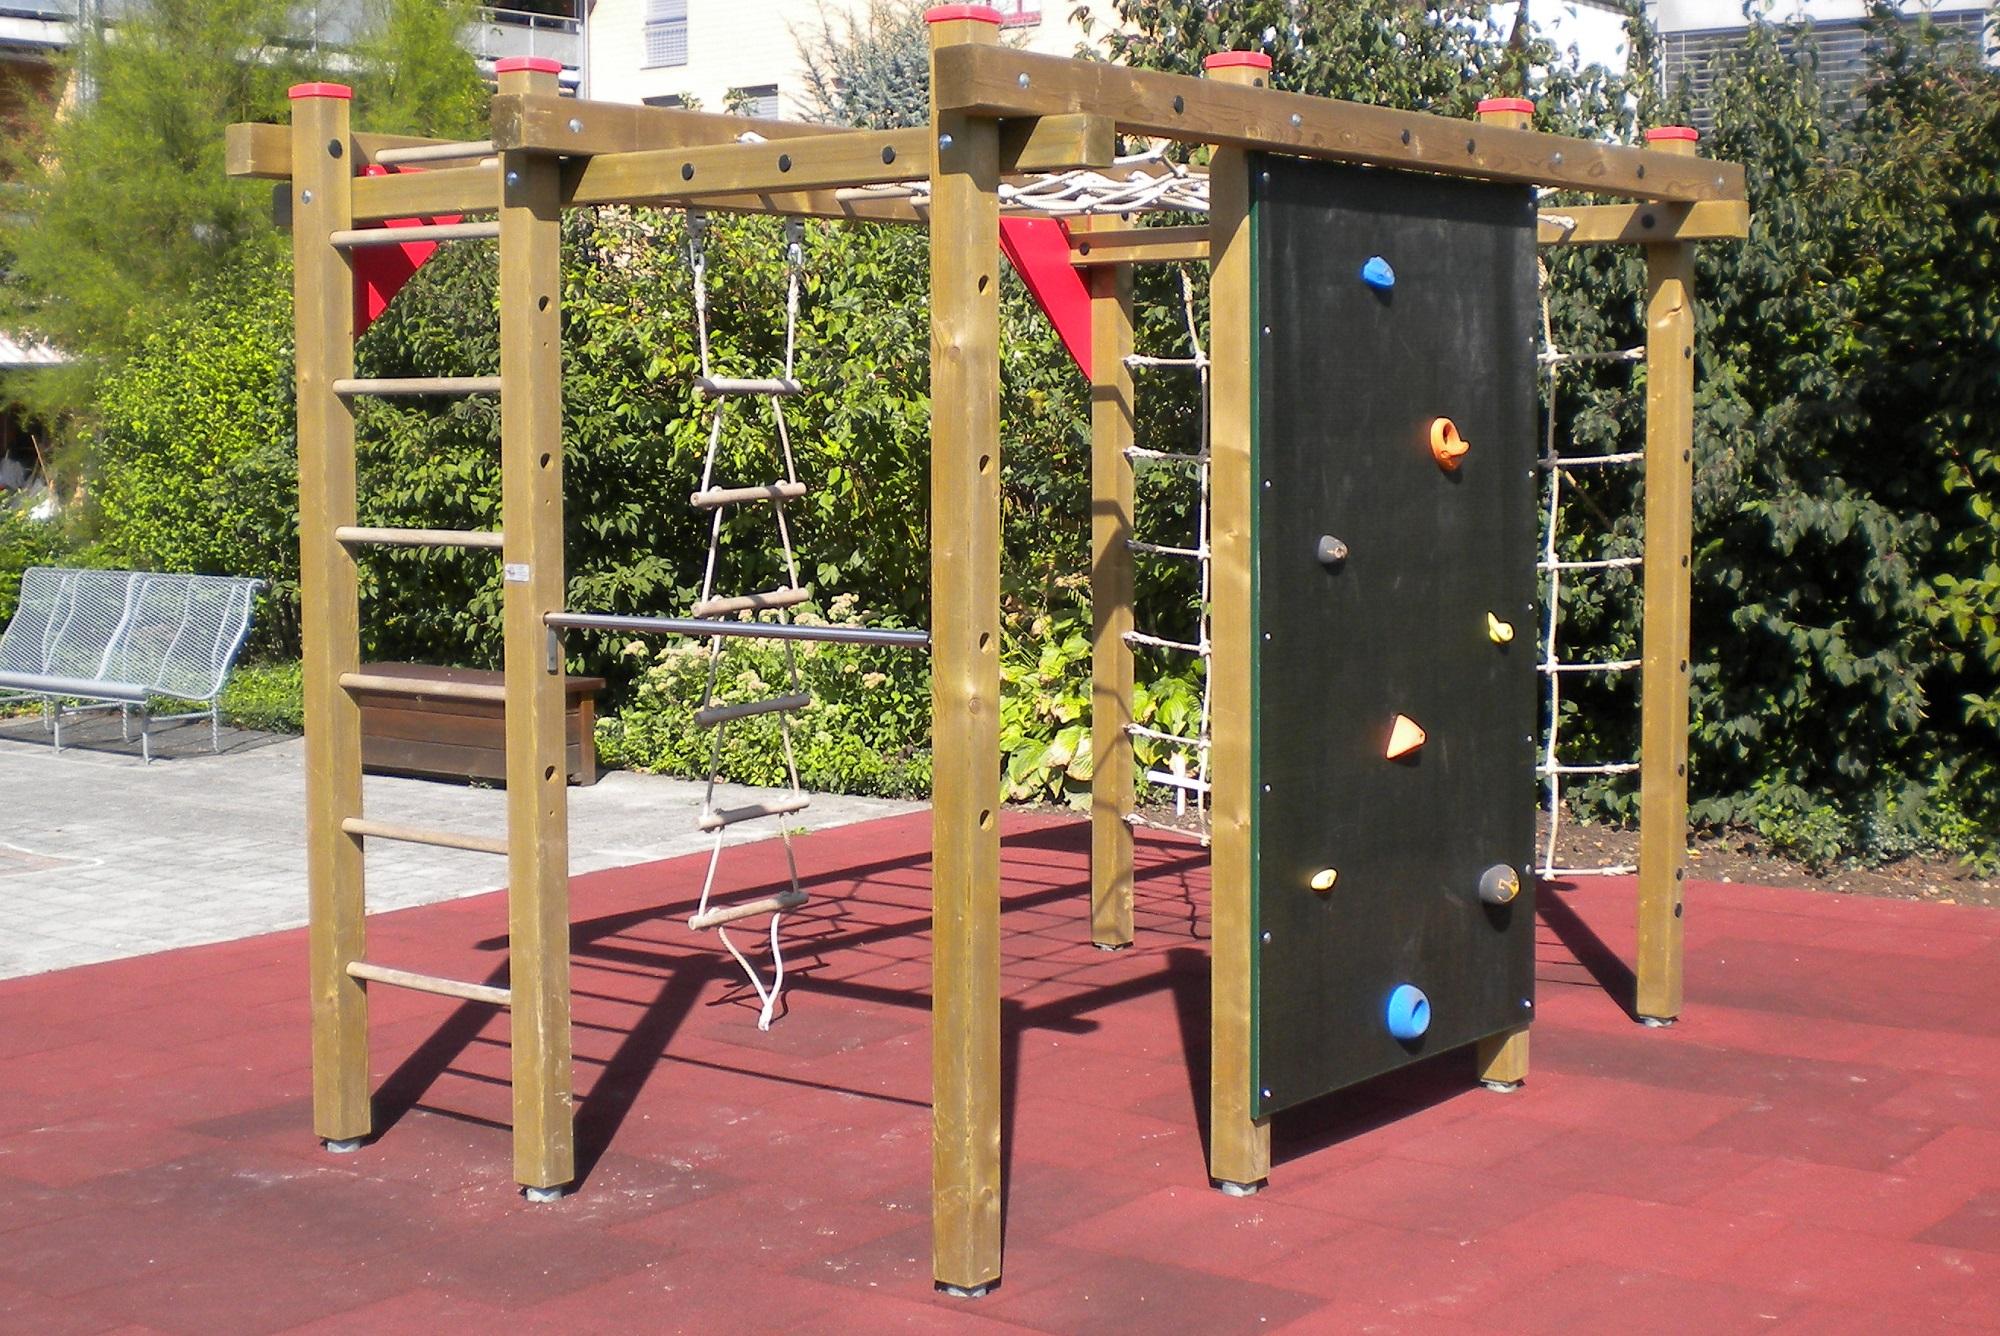 Quadro Klettergerüst Alternative : Klettergerüst quadro die hoppelnden wichtel